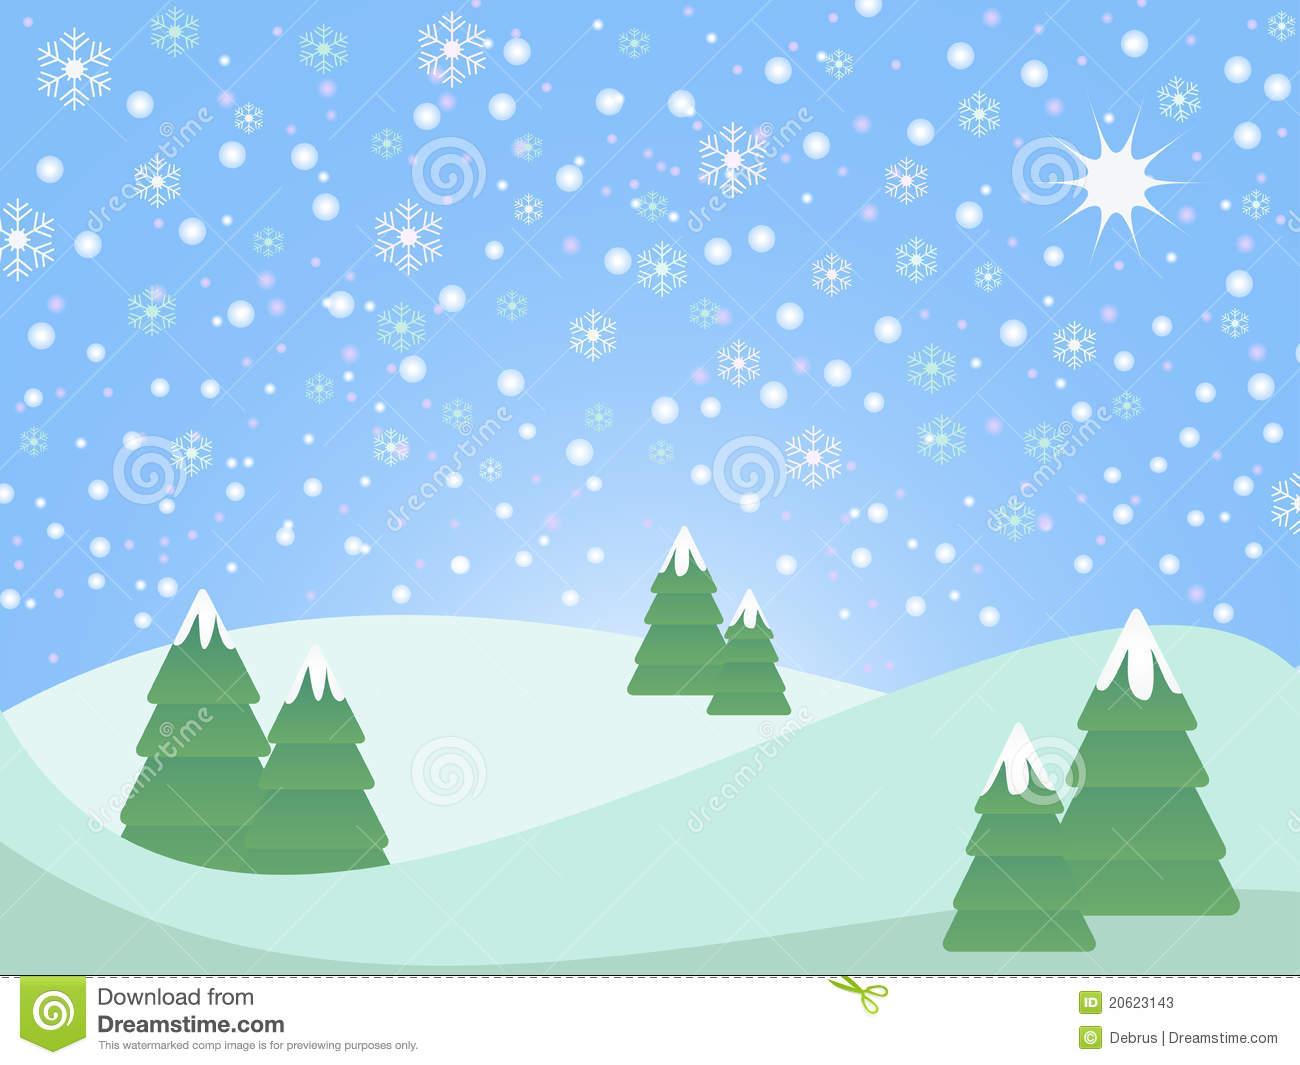 clipart snow scene - photo #33